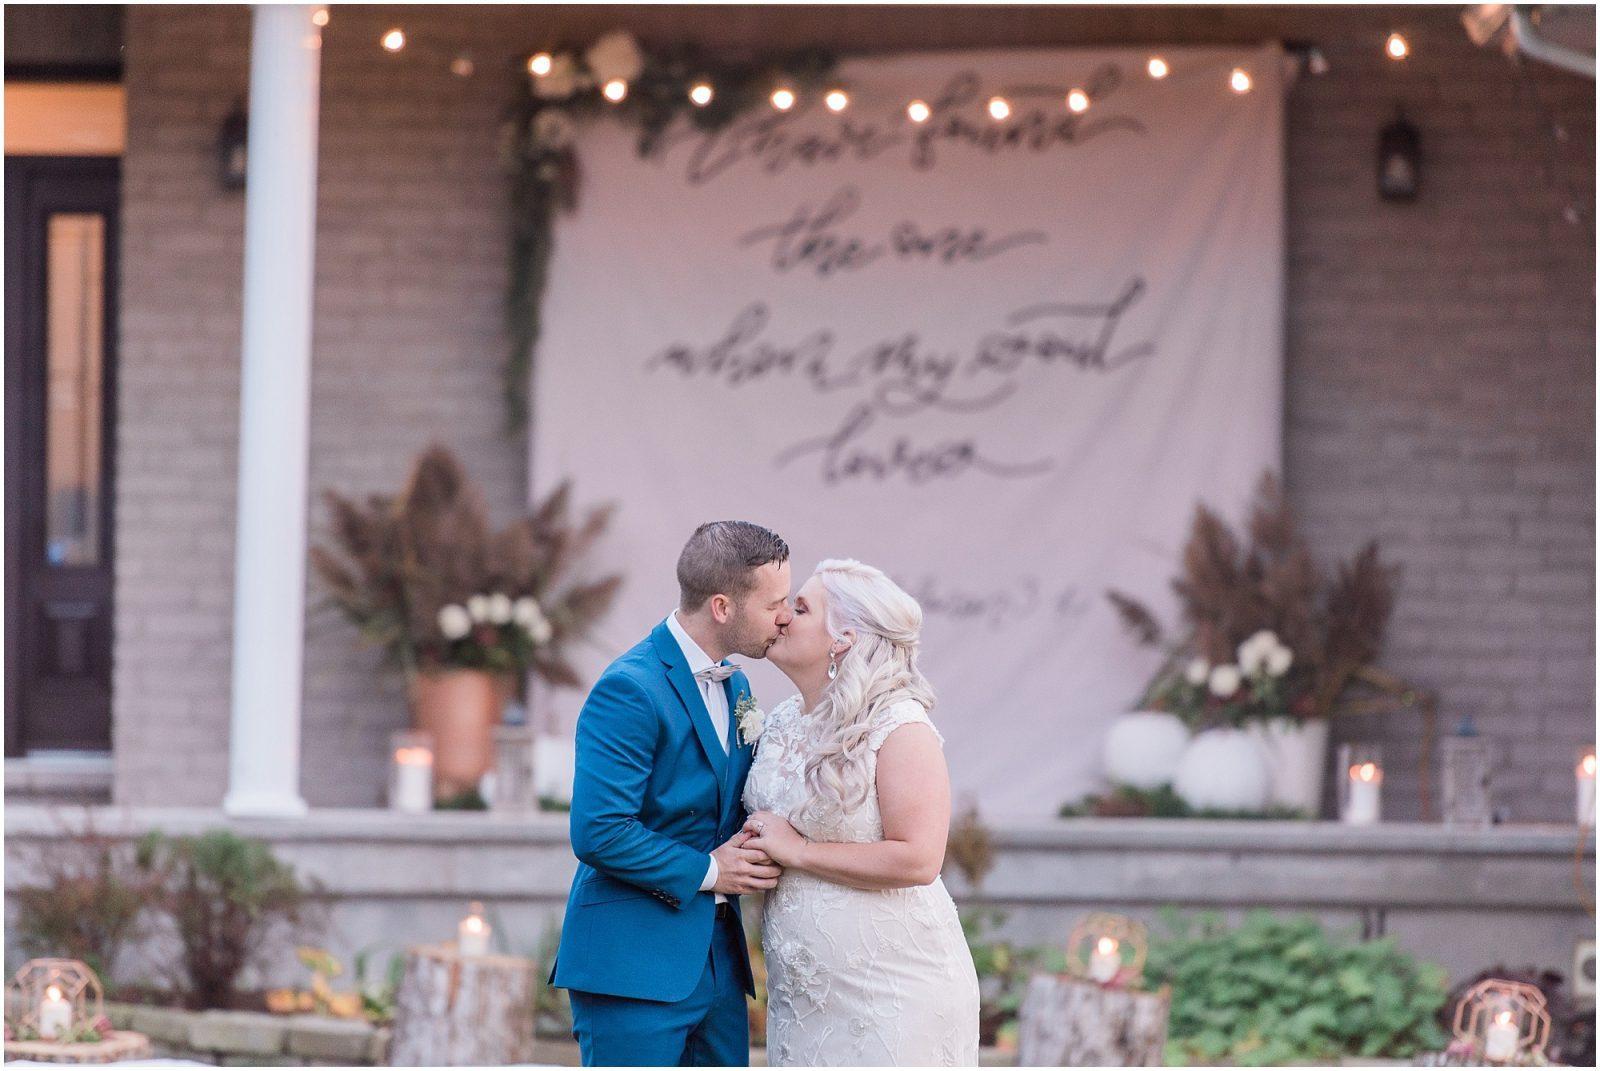 0078 Bethany and Luc - Fall Backyard Ottawa Wedding - Copper and Navy - PhotosbyEmmaH.jpg